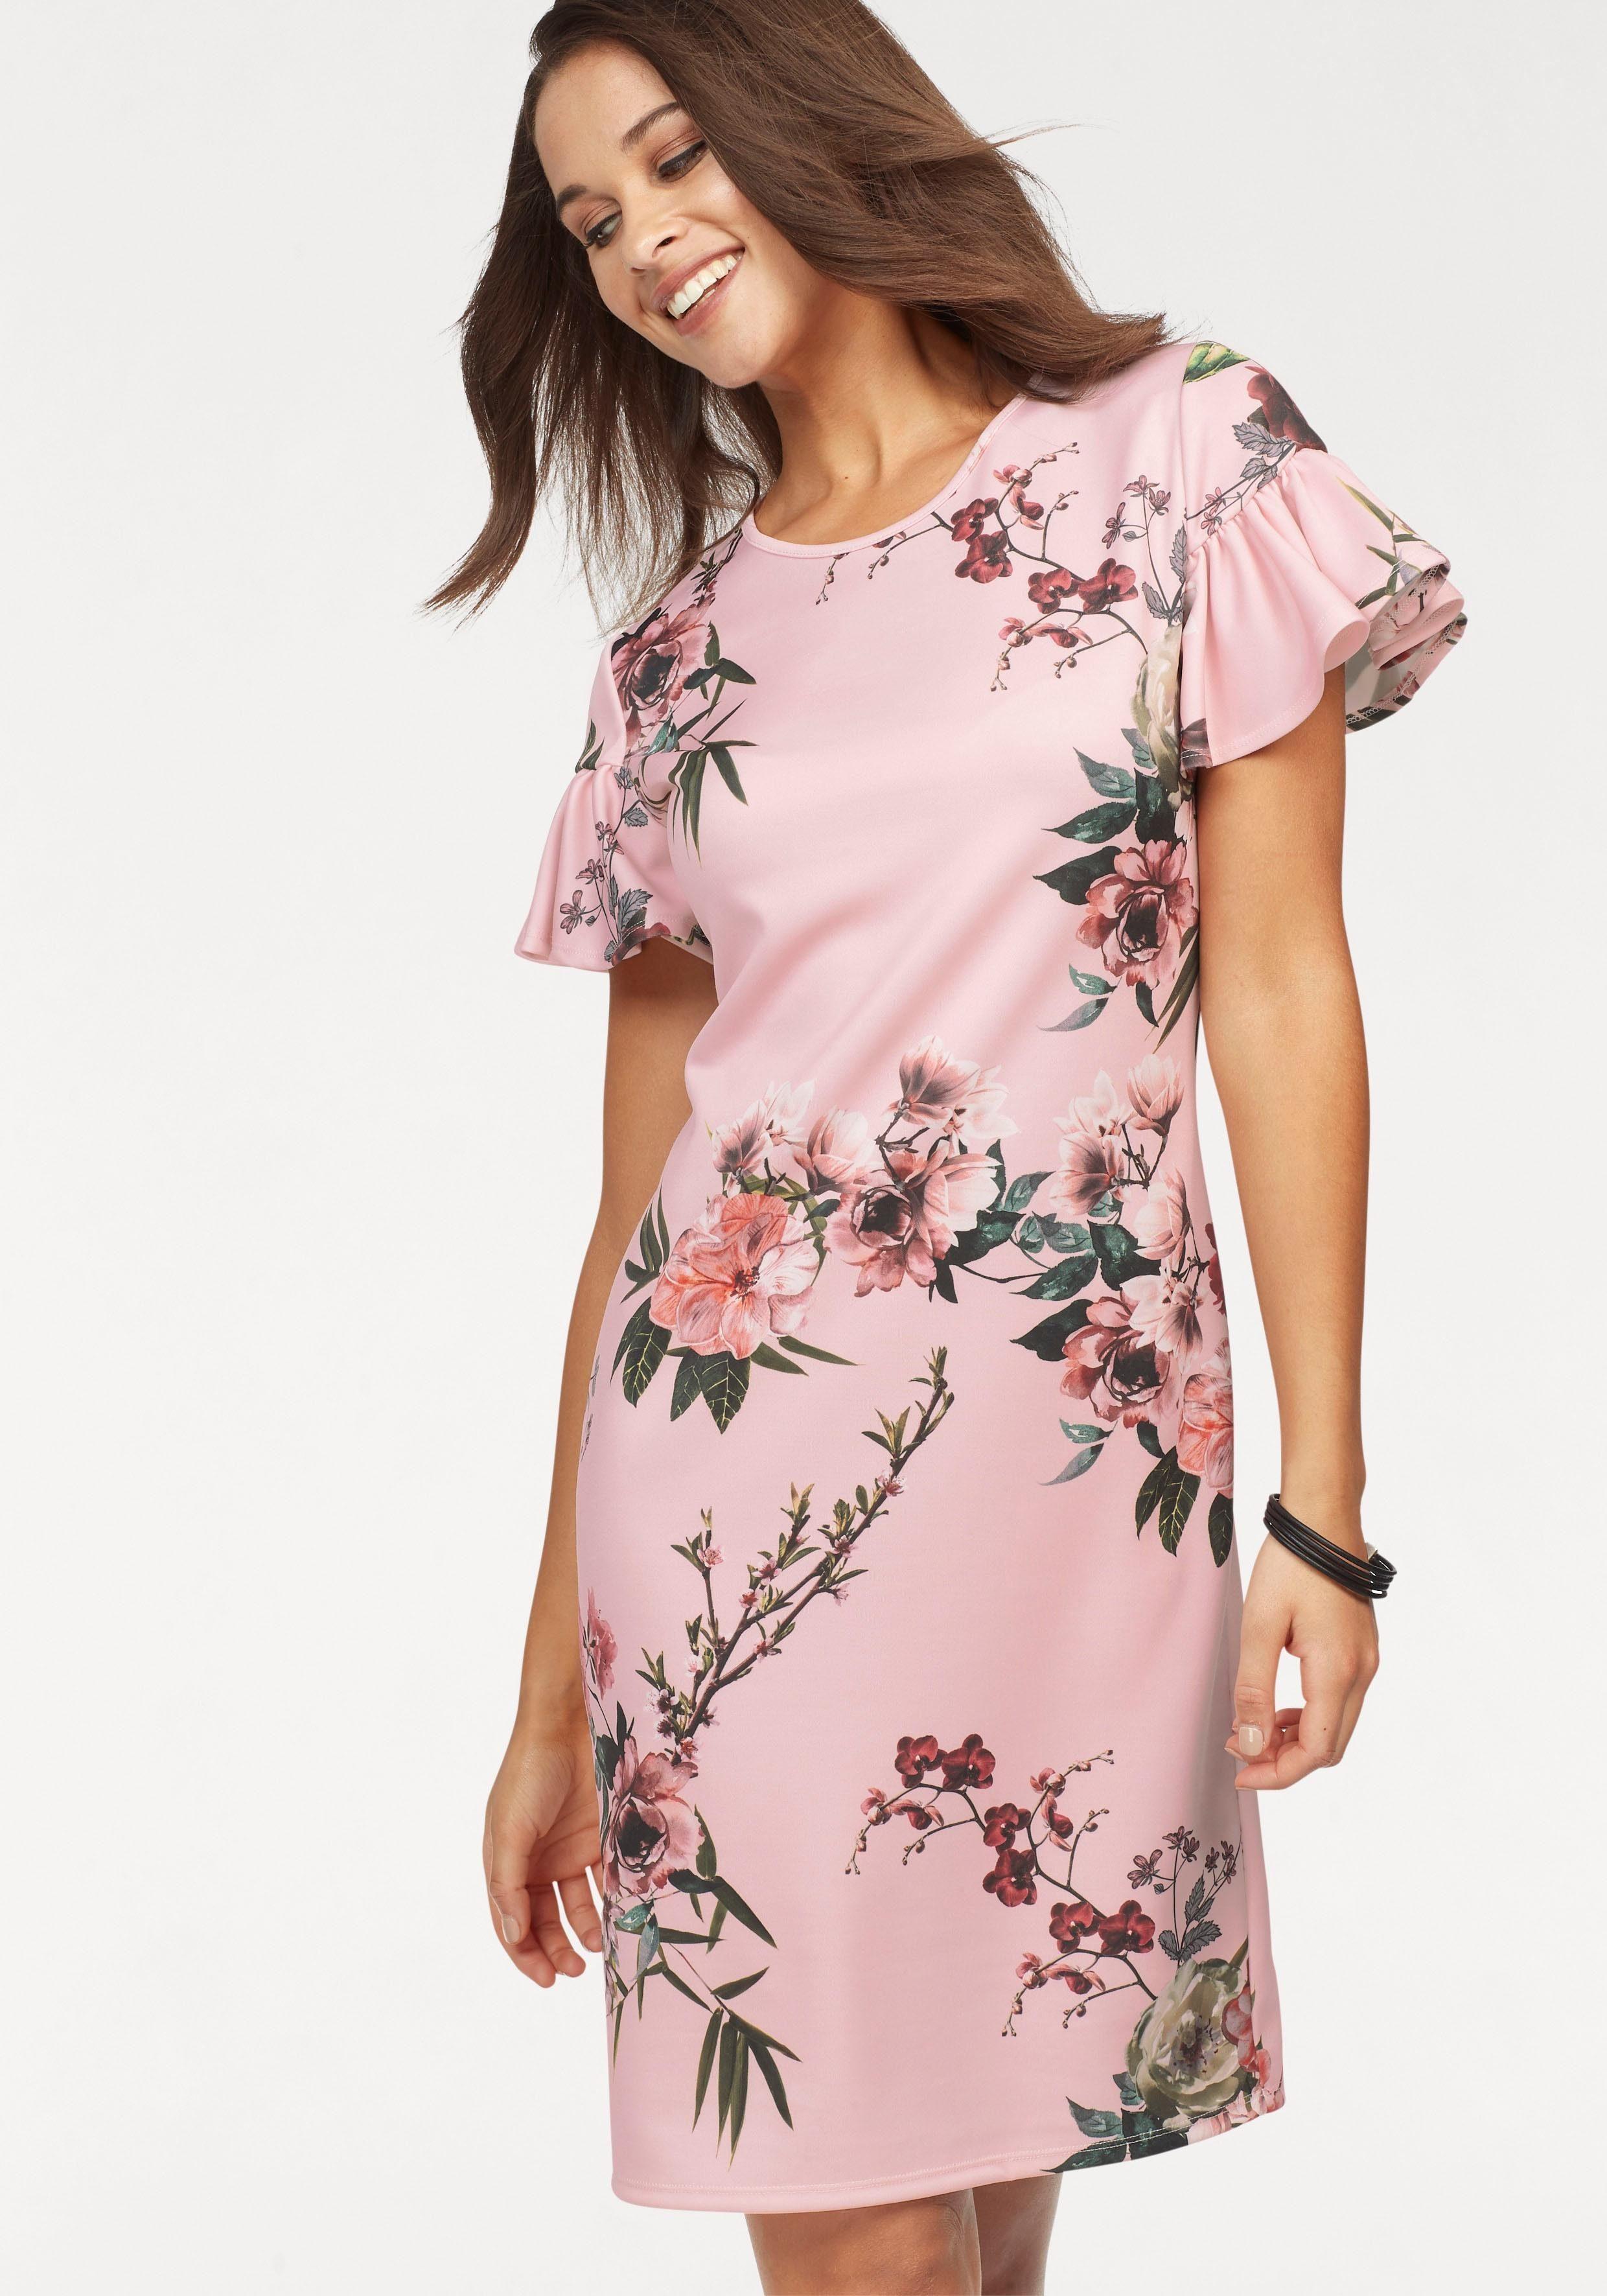 Perkins Kleid Linien A Online Dorothy KaufenOtto b6gf7y